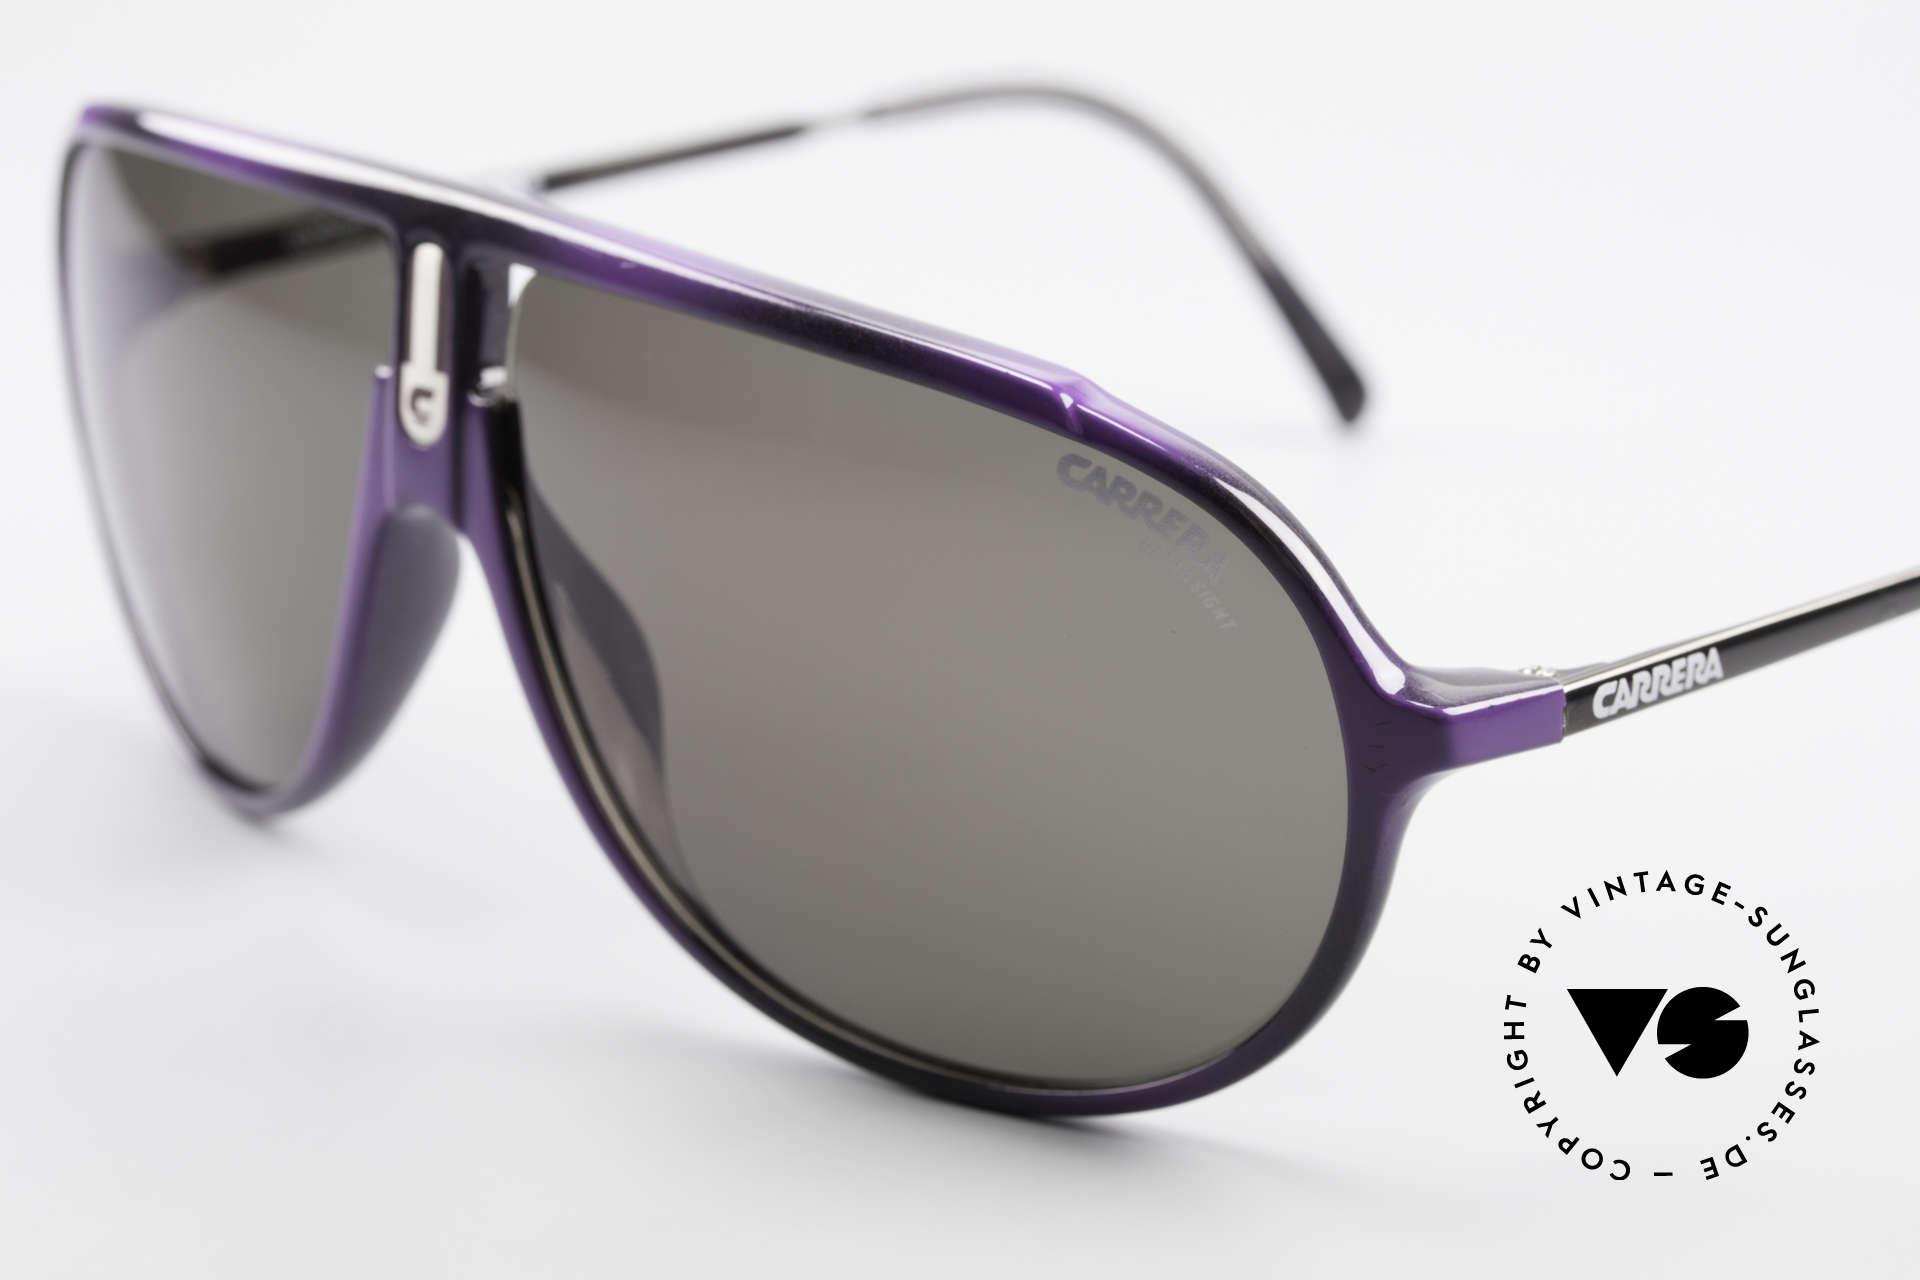 Carrera 5467 Carbon Fibre Shades Vintage, CARRERA ULTRASIGHT lenses (100% UV protect.), Made for Men